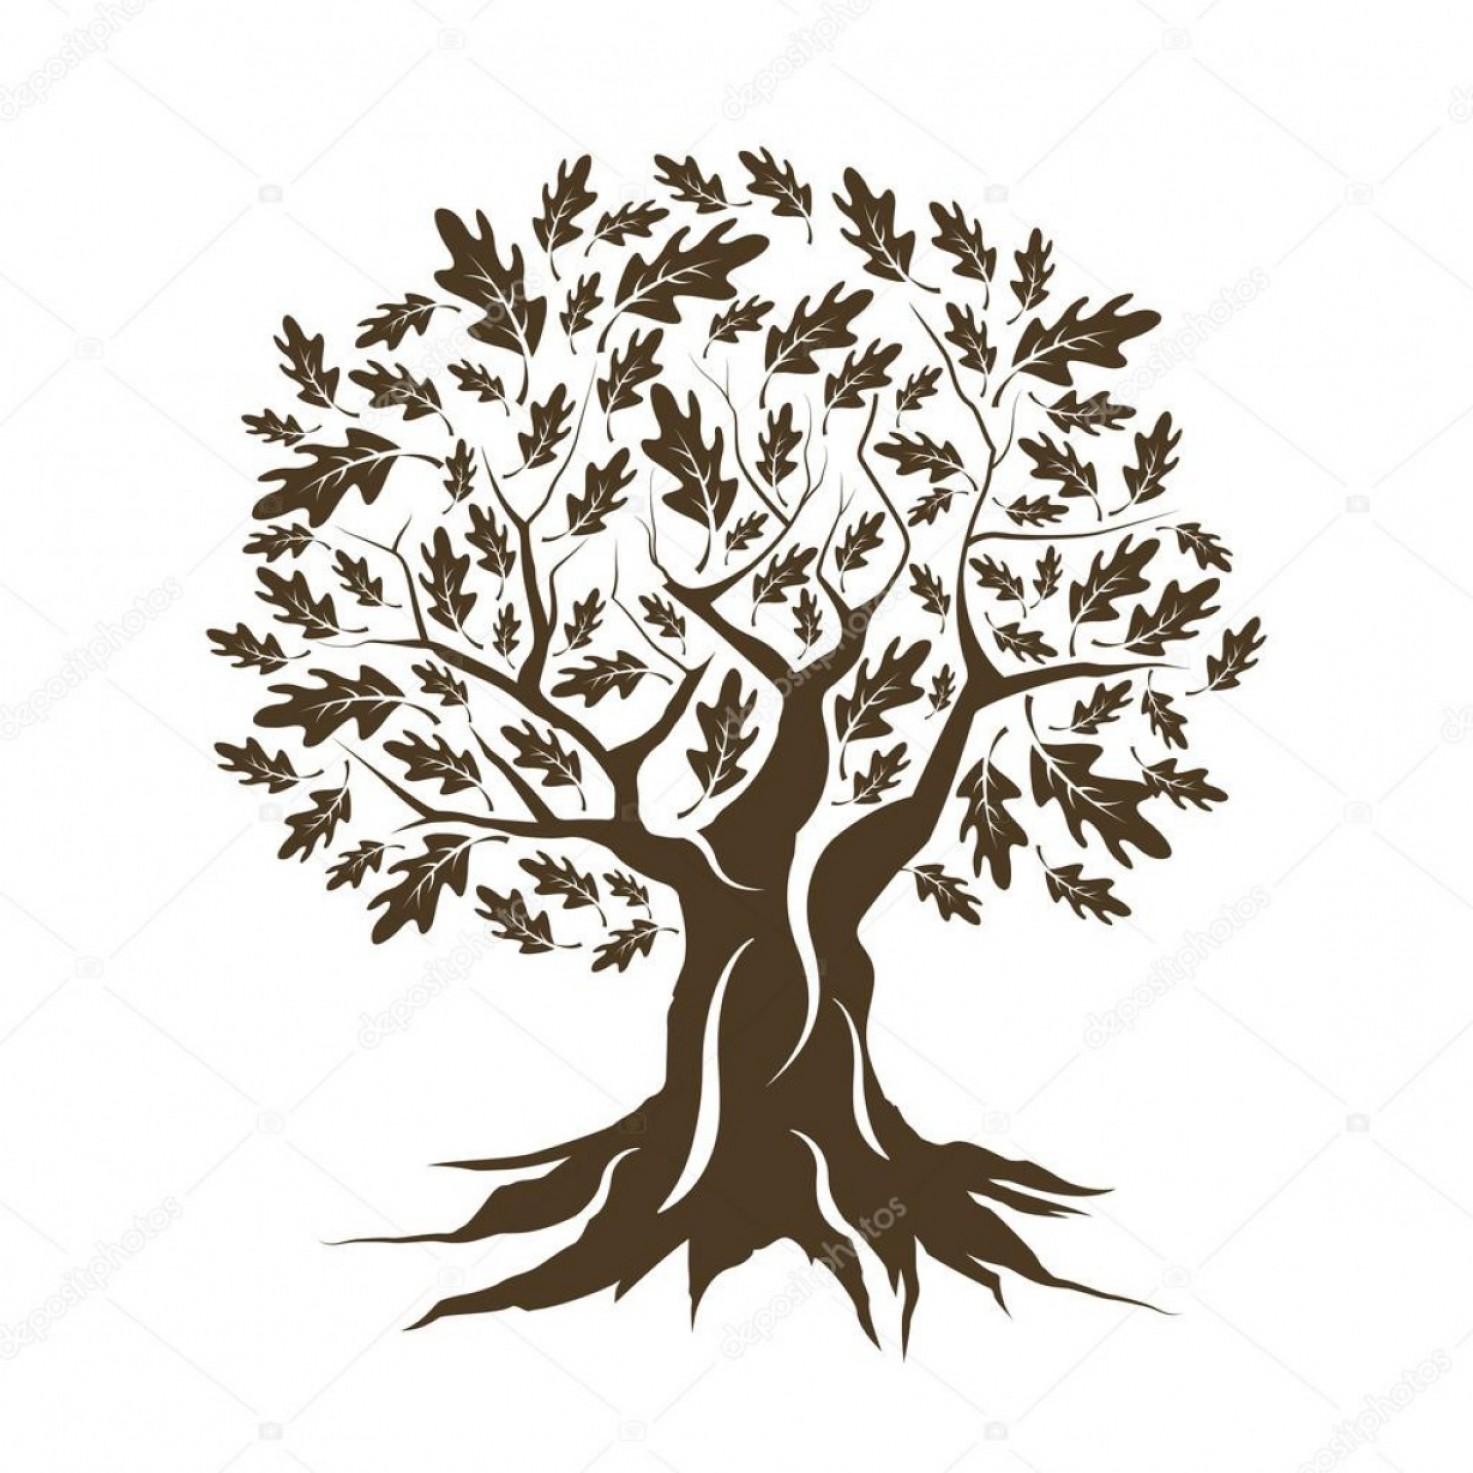 Stock Illustration Beautiful Brown Oak Tree Silhouette.